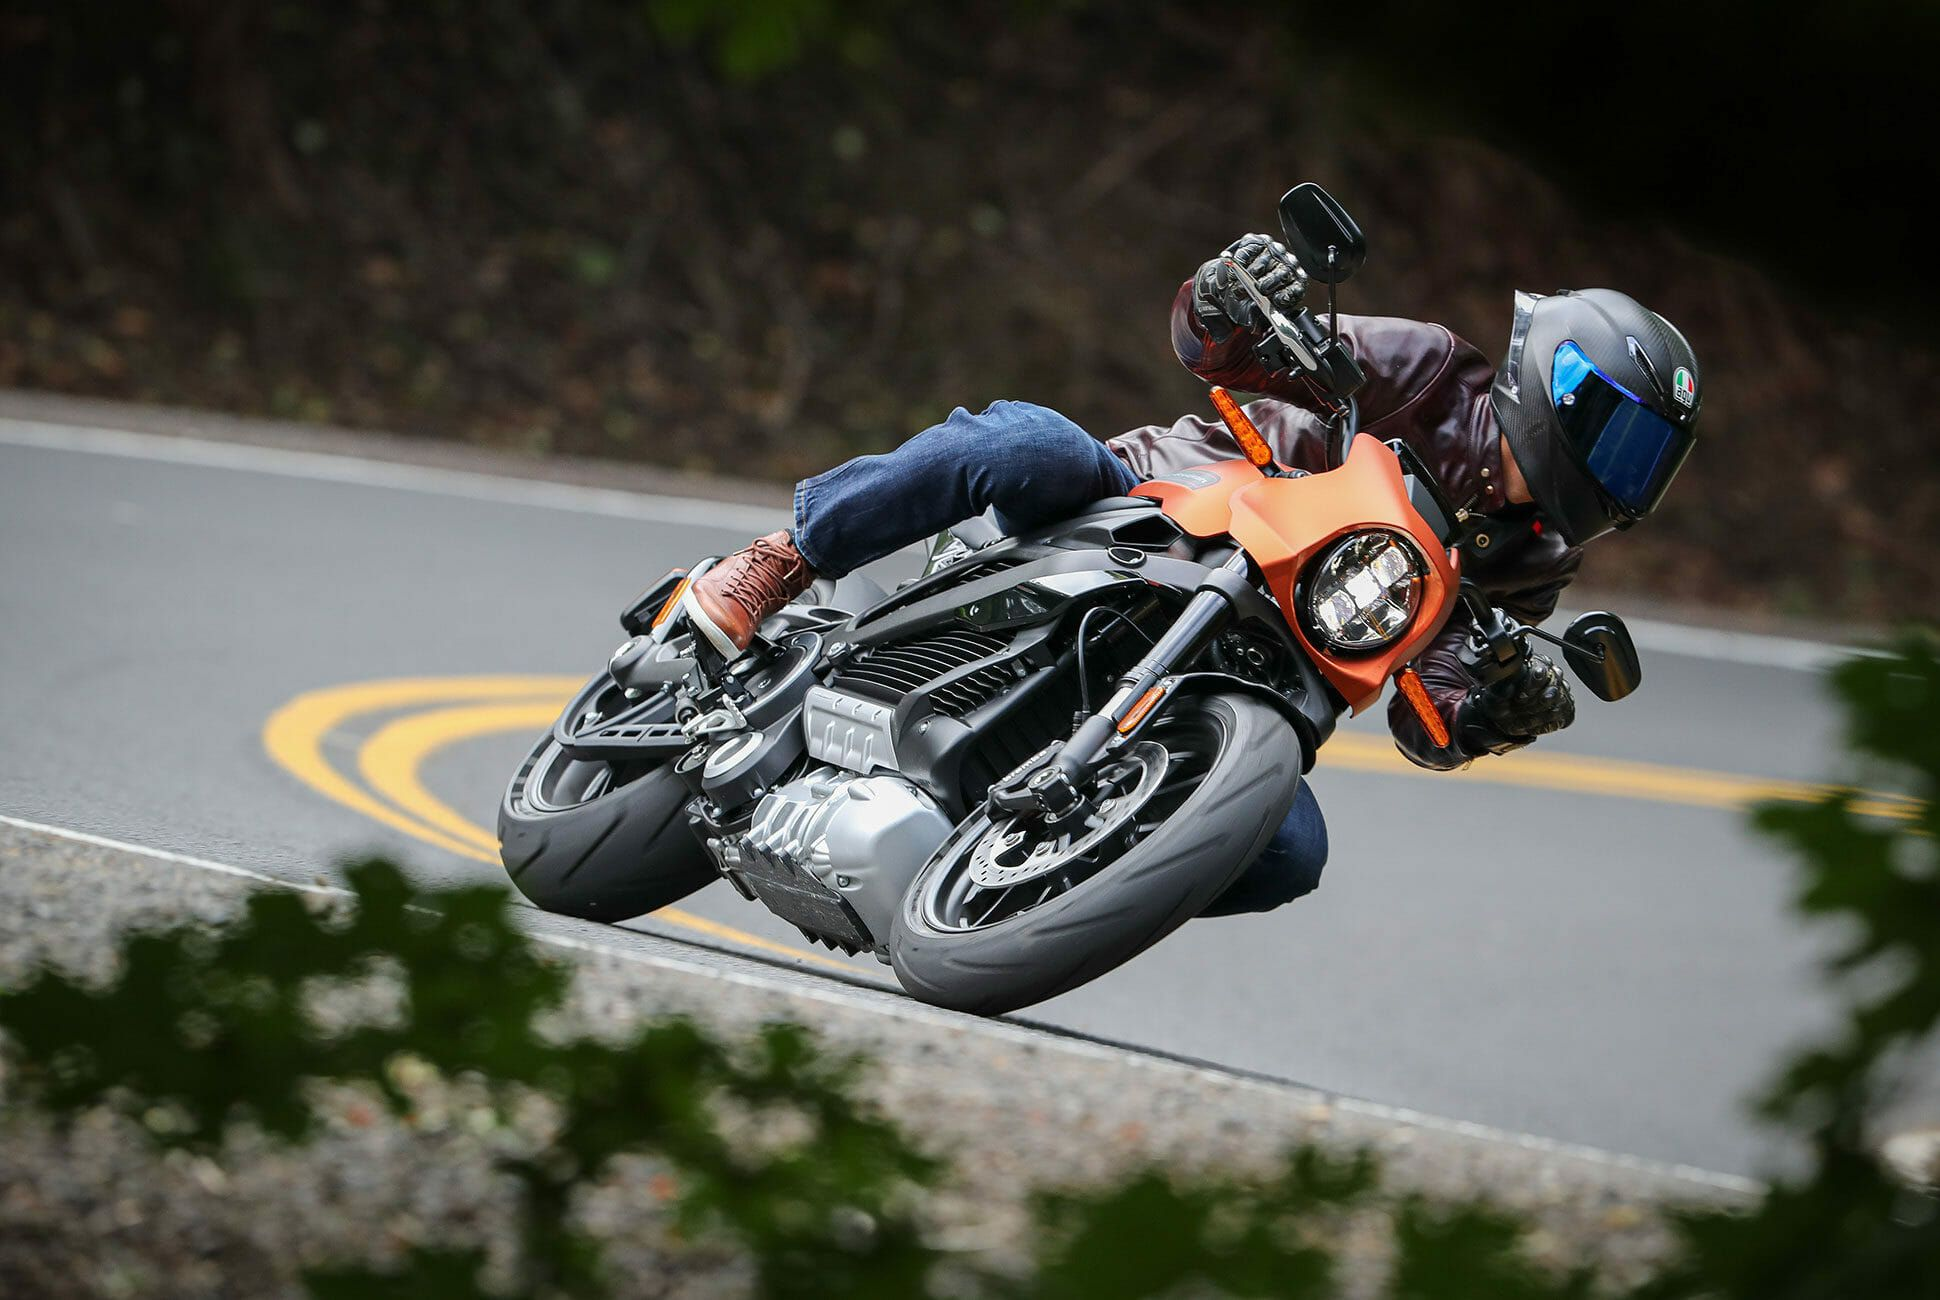 Harley-Davidson-LiveWire-Review-gear-patrol-slide-2